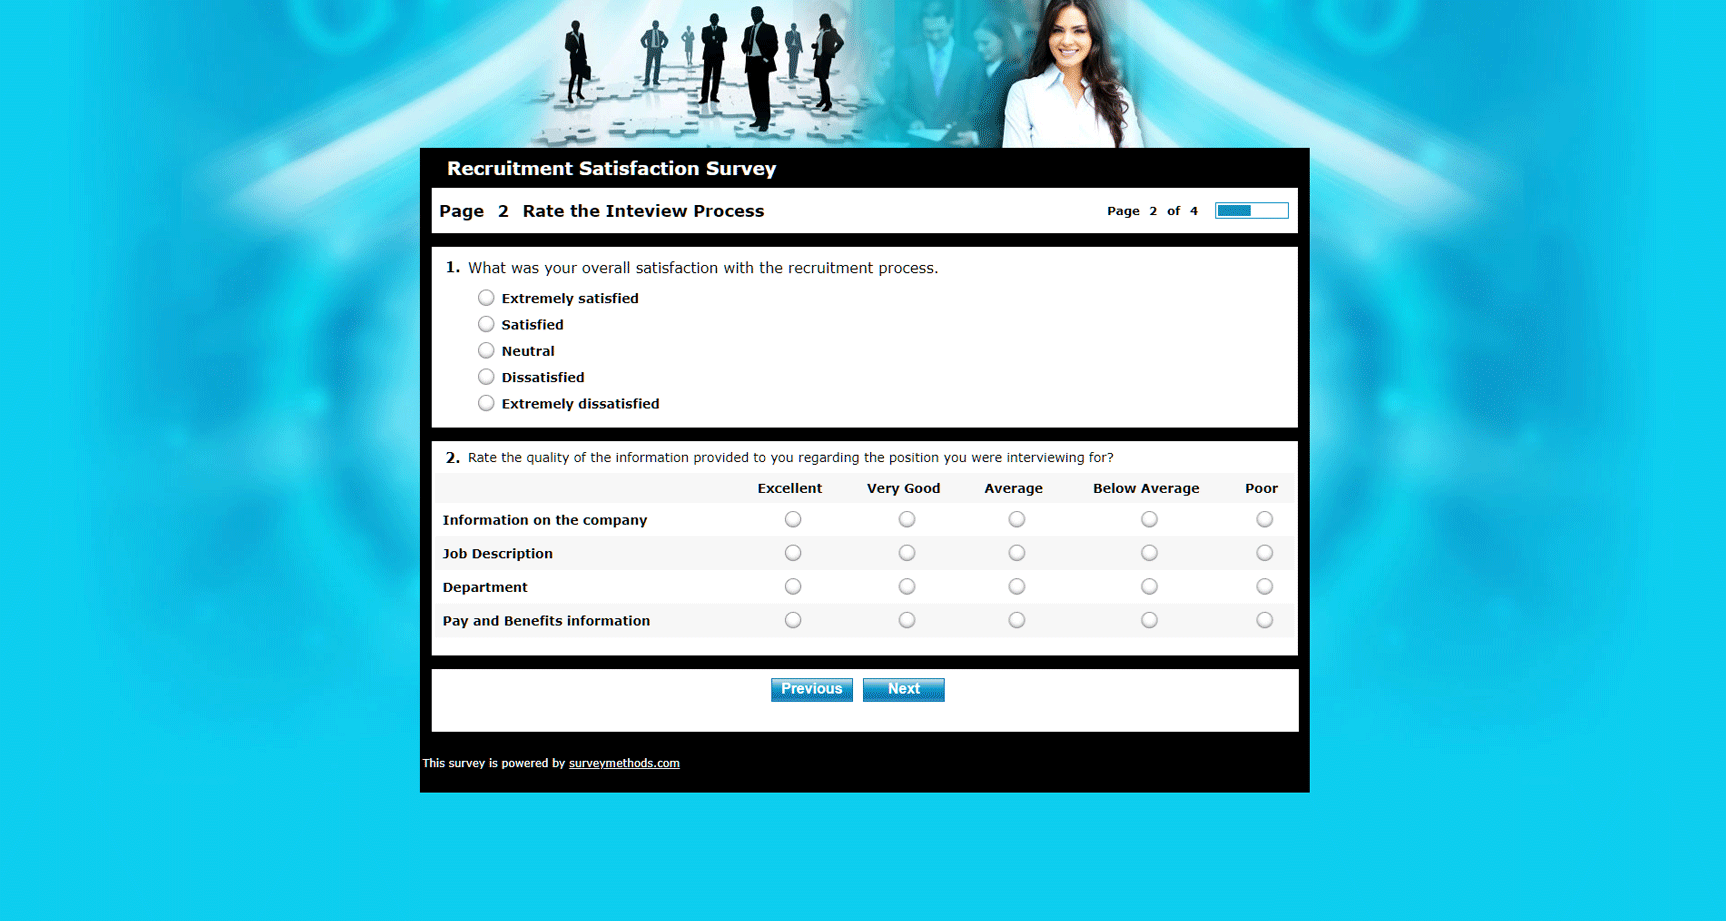 Recruitment Satisfaction Survey